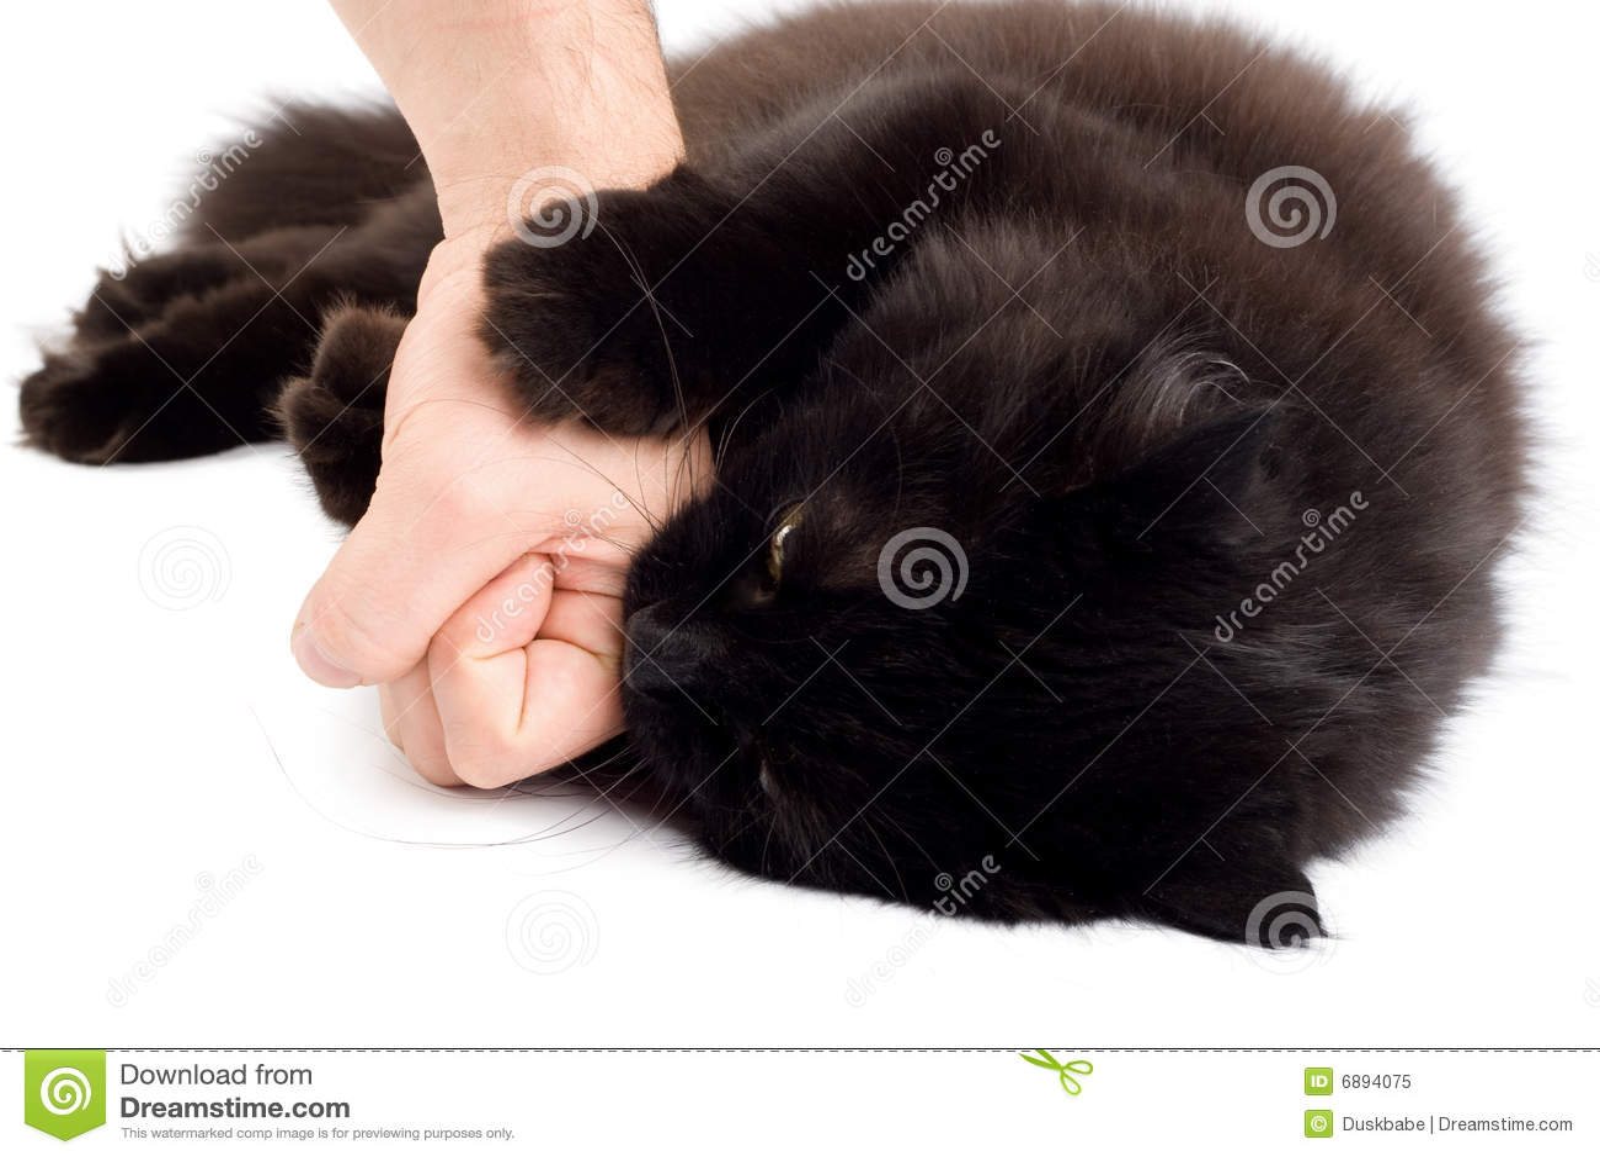 cat bite fever treatment